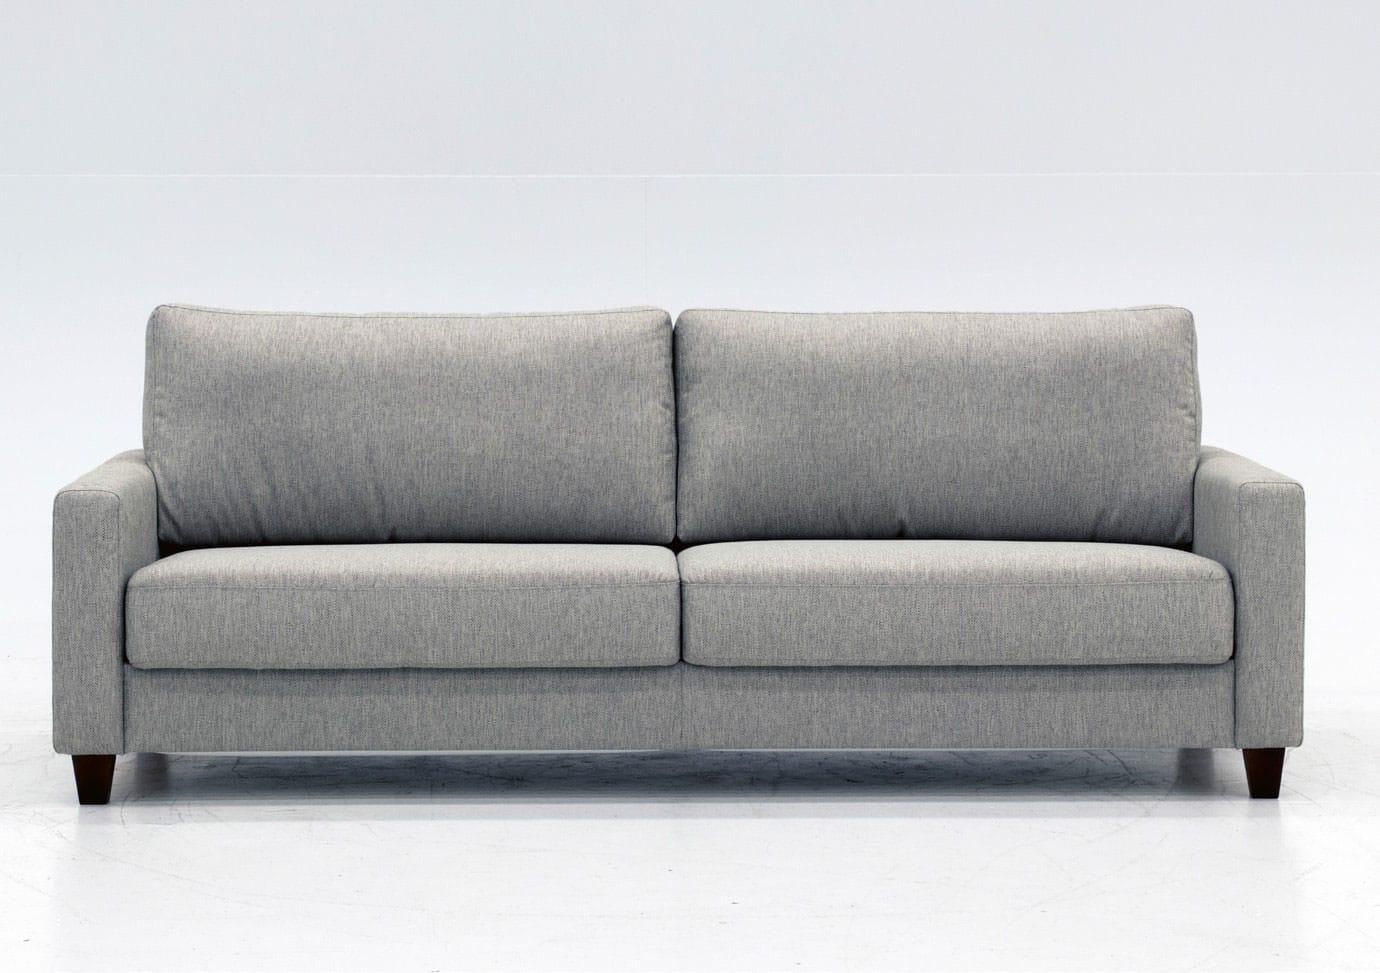 Nico Sofa Sleeper King Size By Luonto